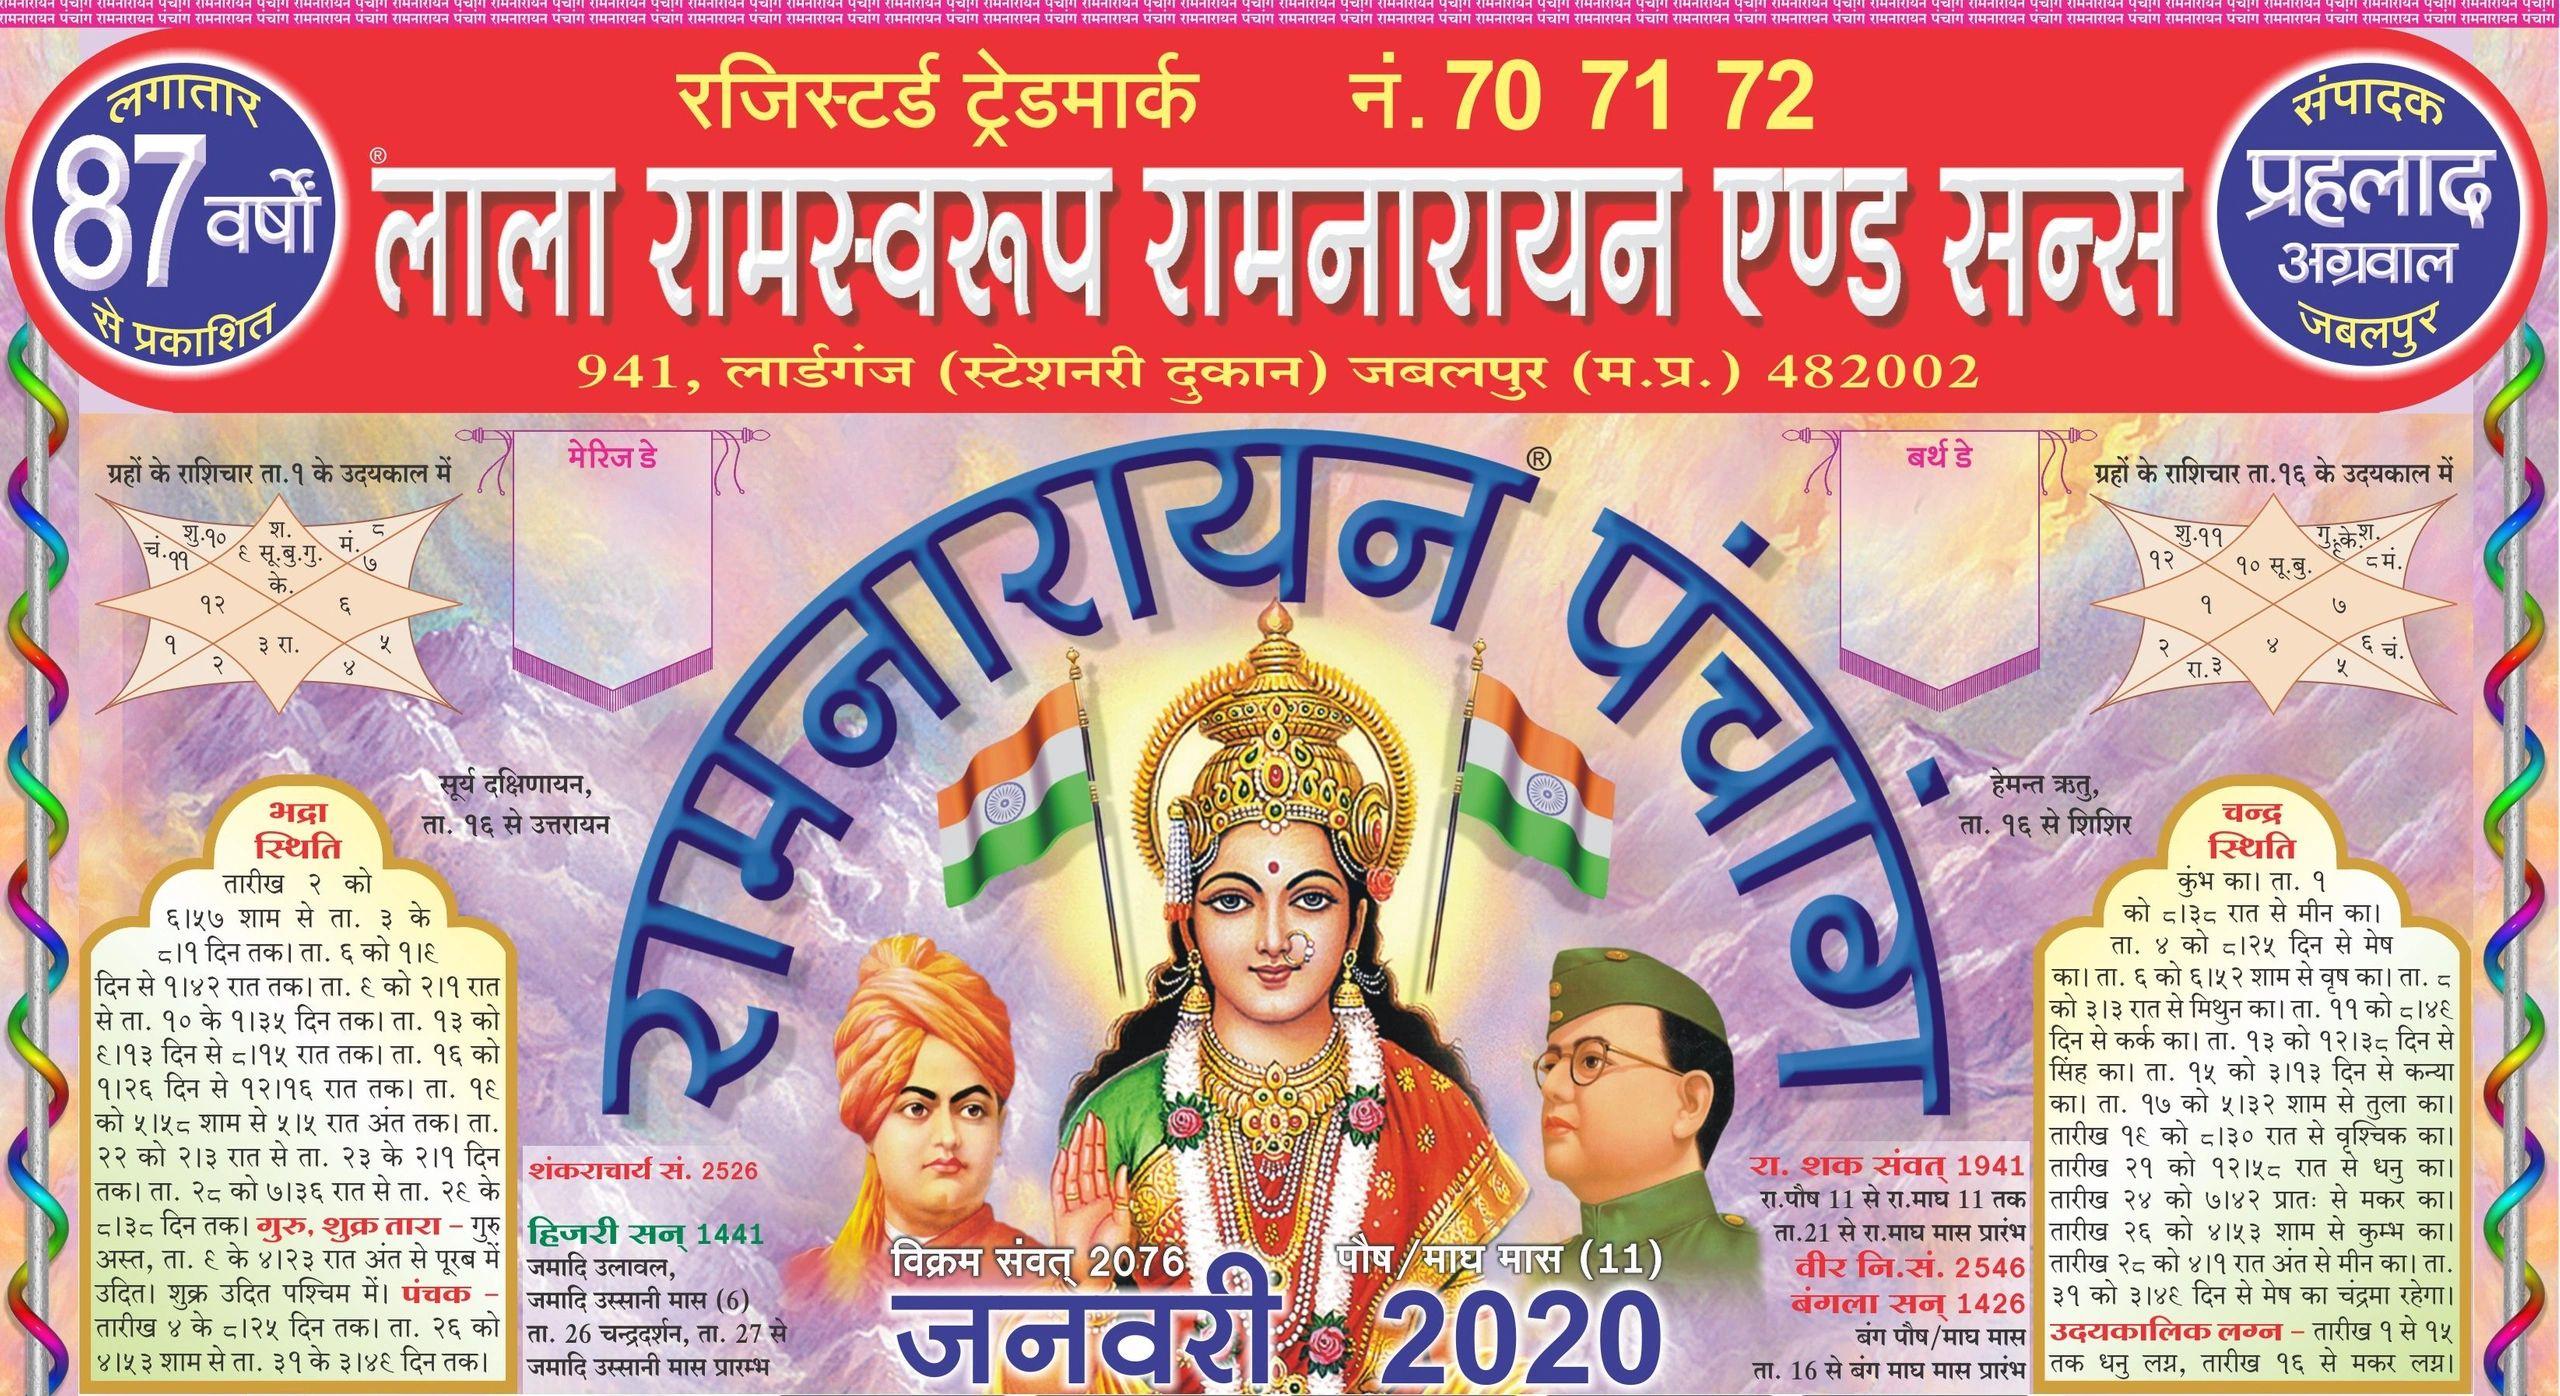 Www.lalaramswaroop regarding Lala Ramswaroop Calendar 2020